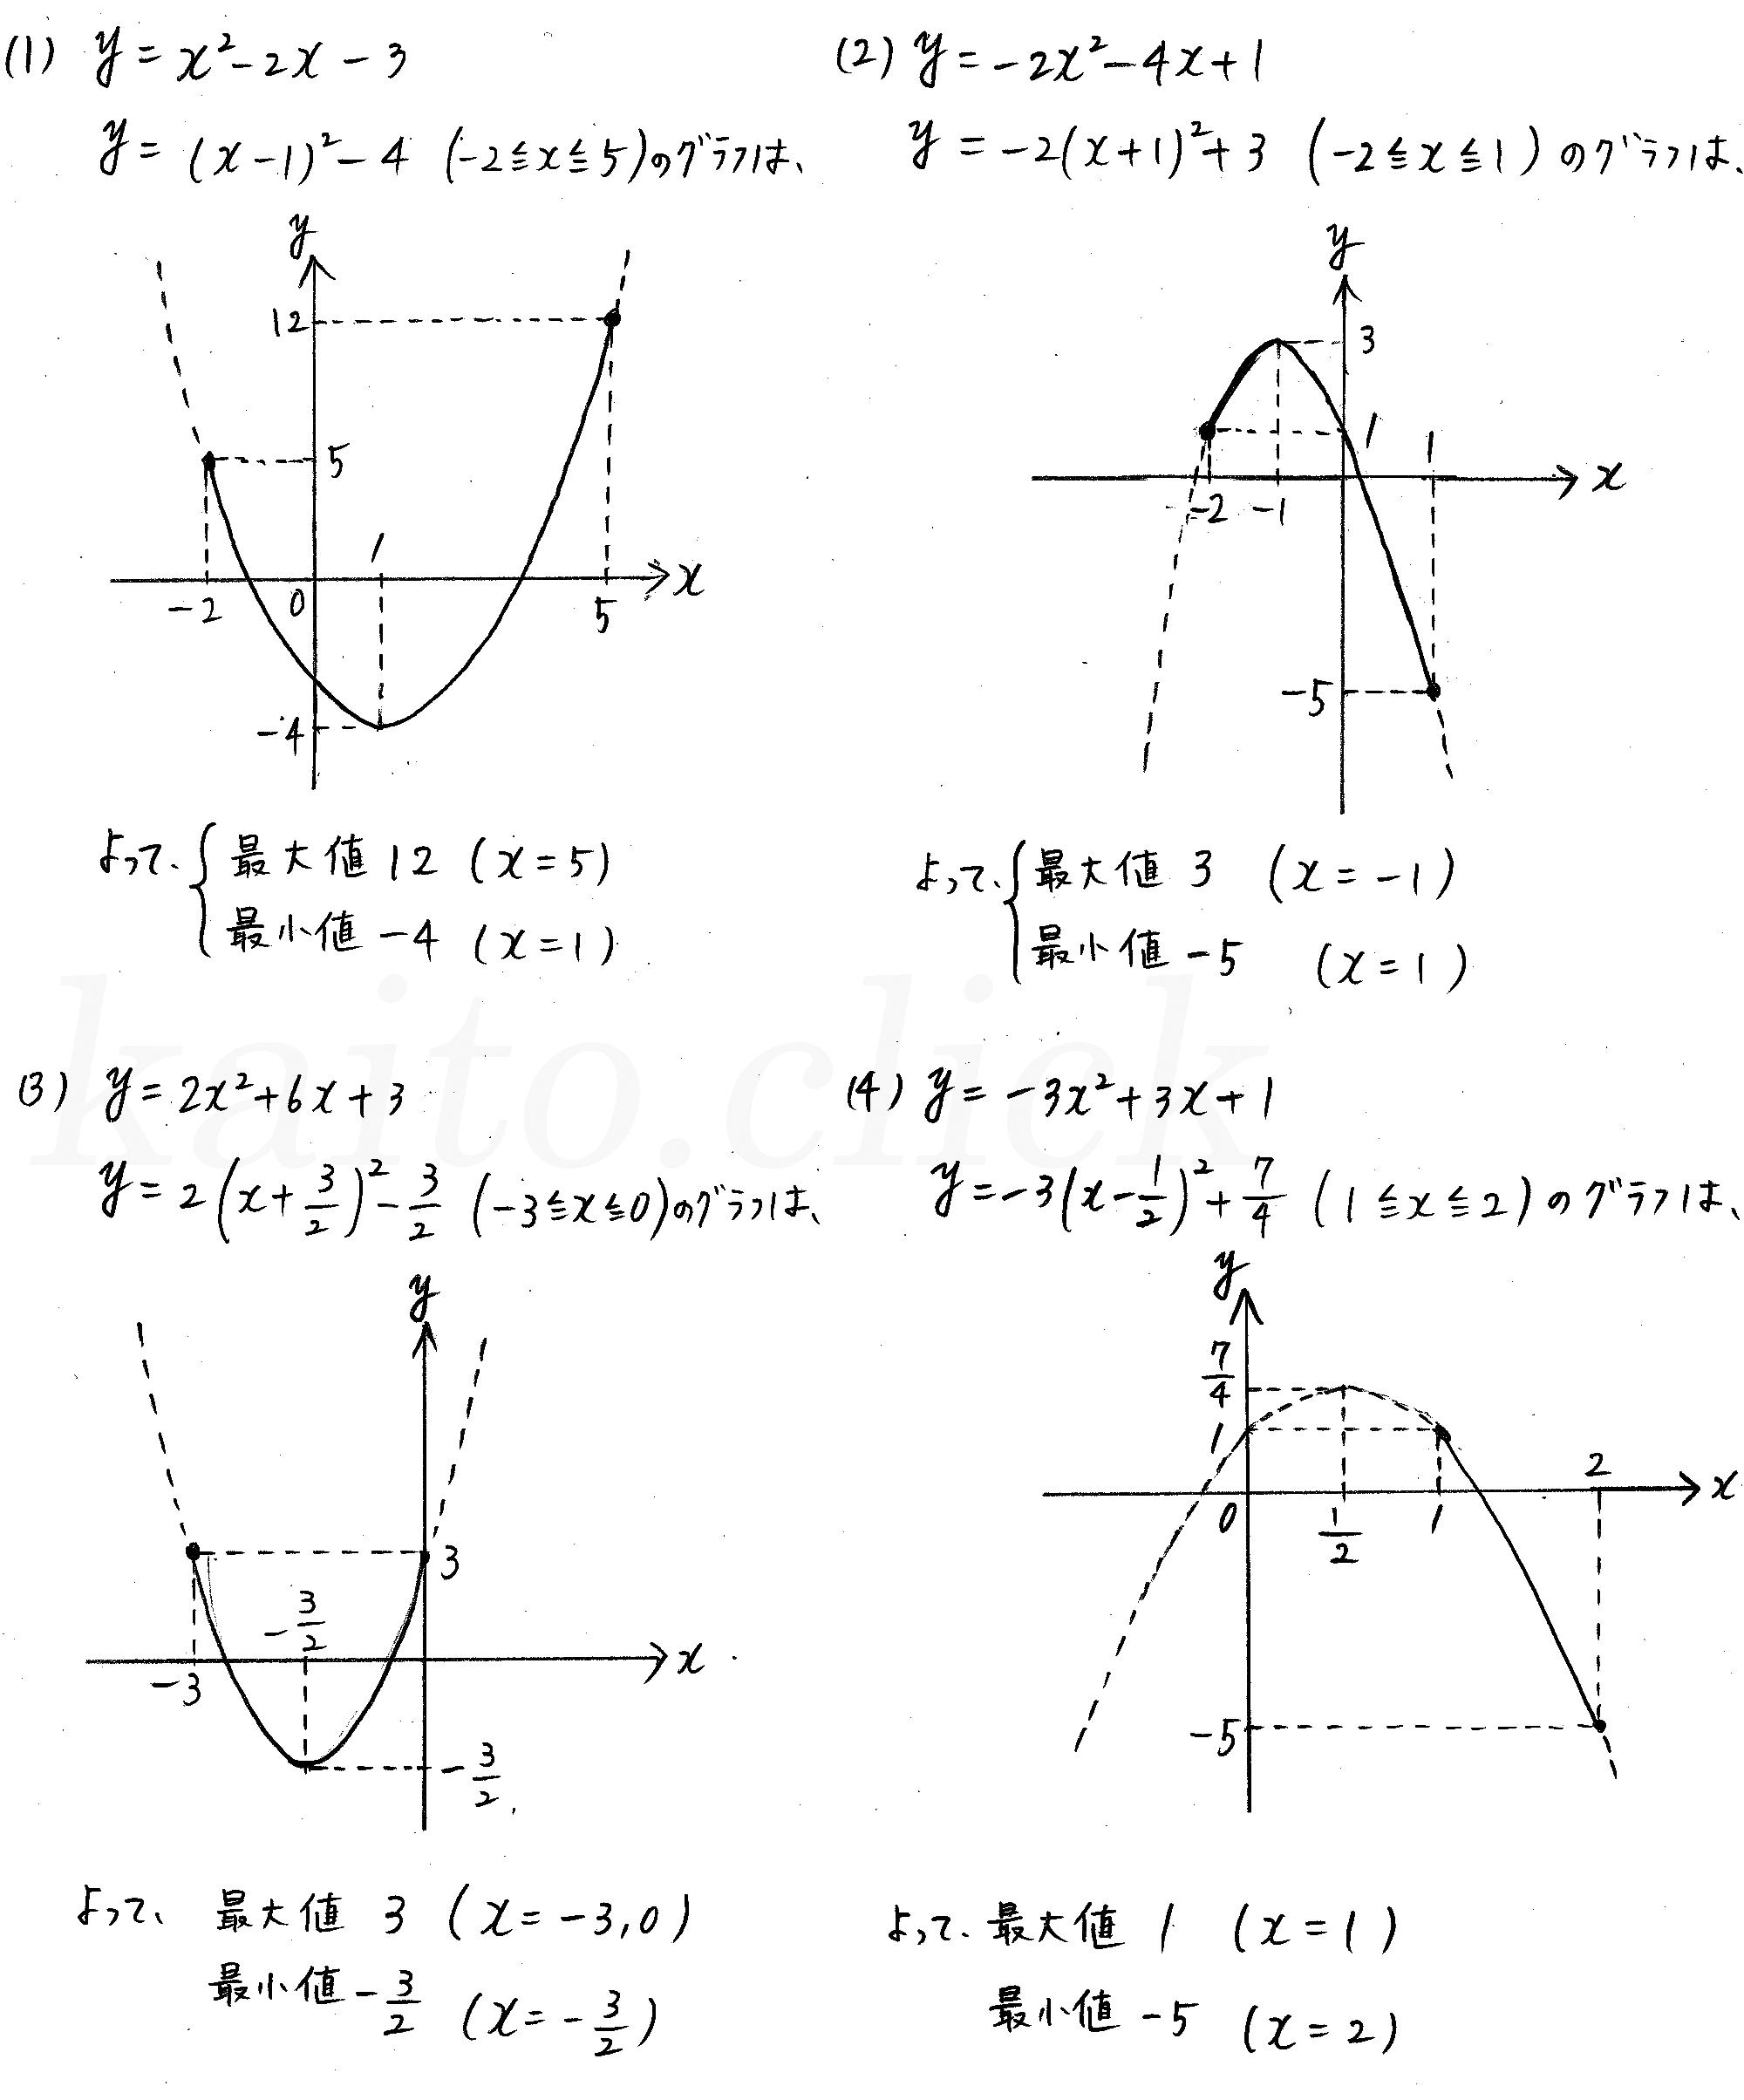 3TRIAL数学Ⅰ-141解答